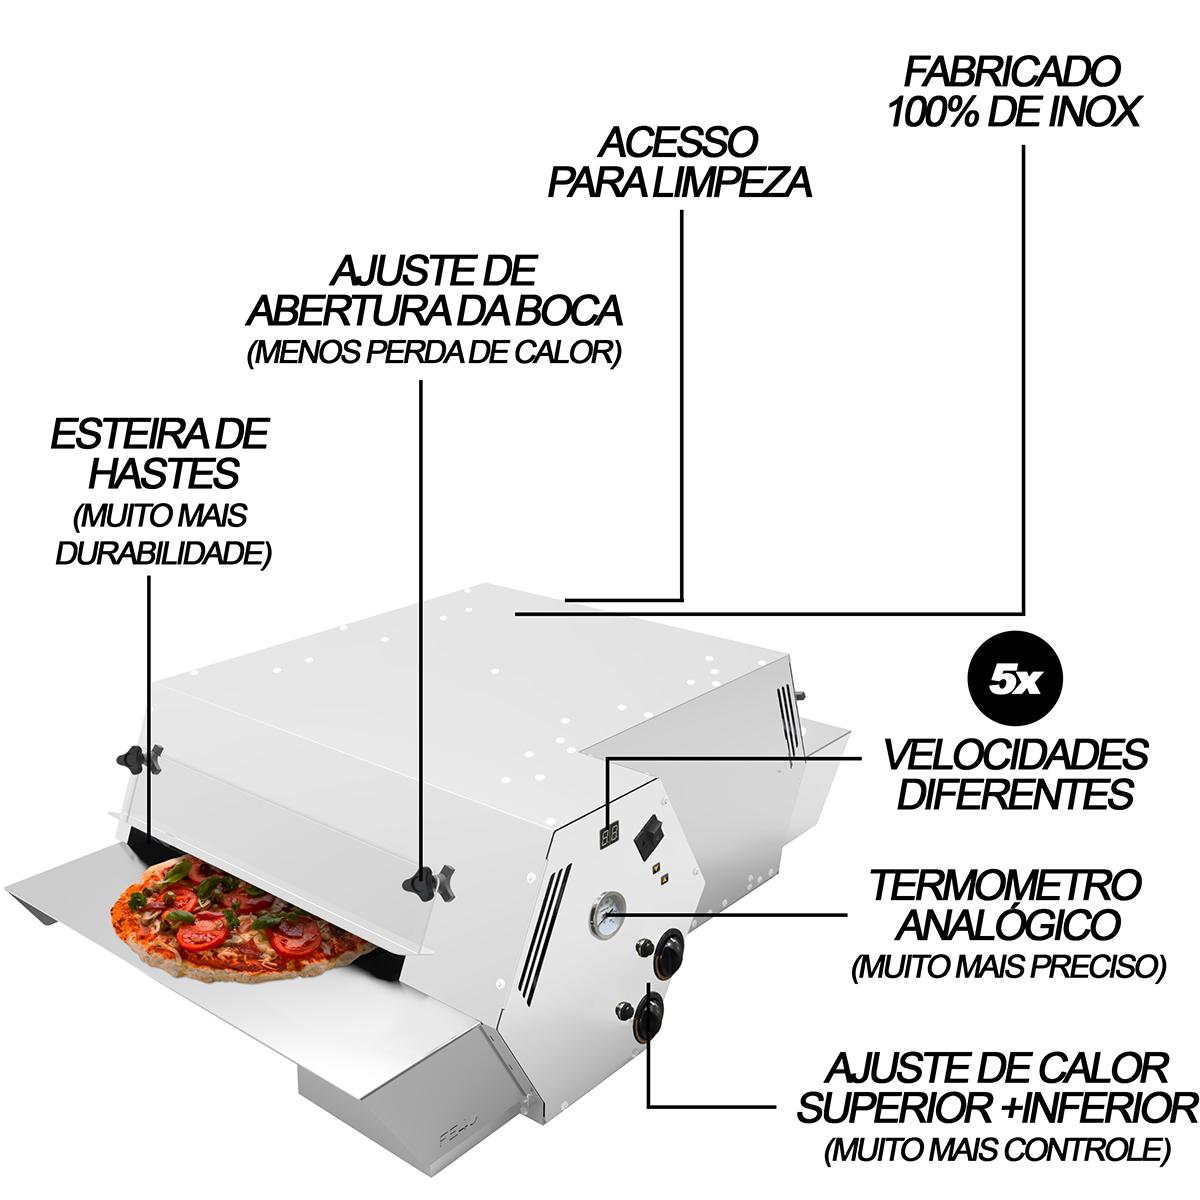 Forno Esteira Industrial Assador a Gás Para Pizzas de 40cm  5 Velocidades 220V - Saro  - Carmel Equipamentos